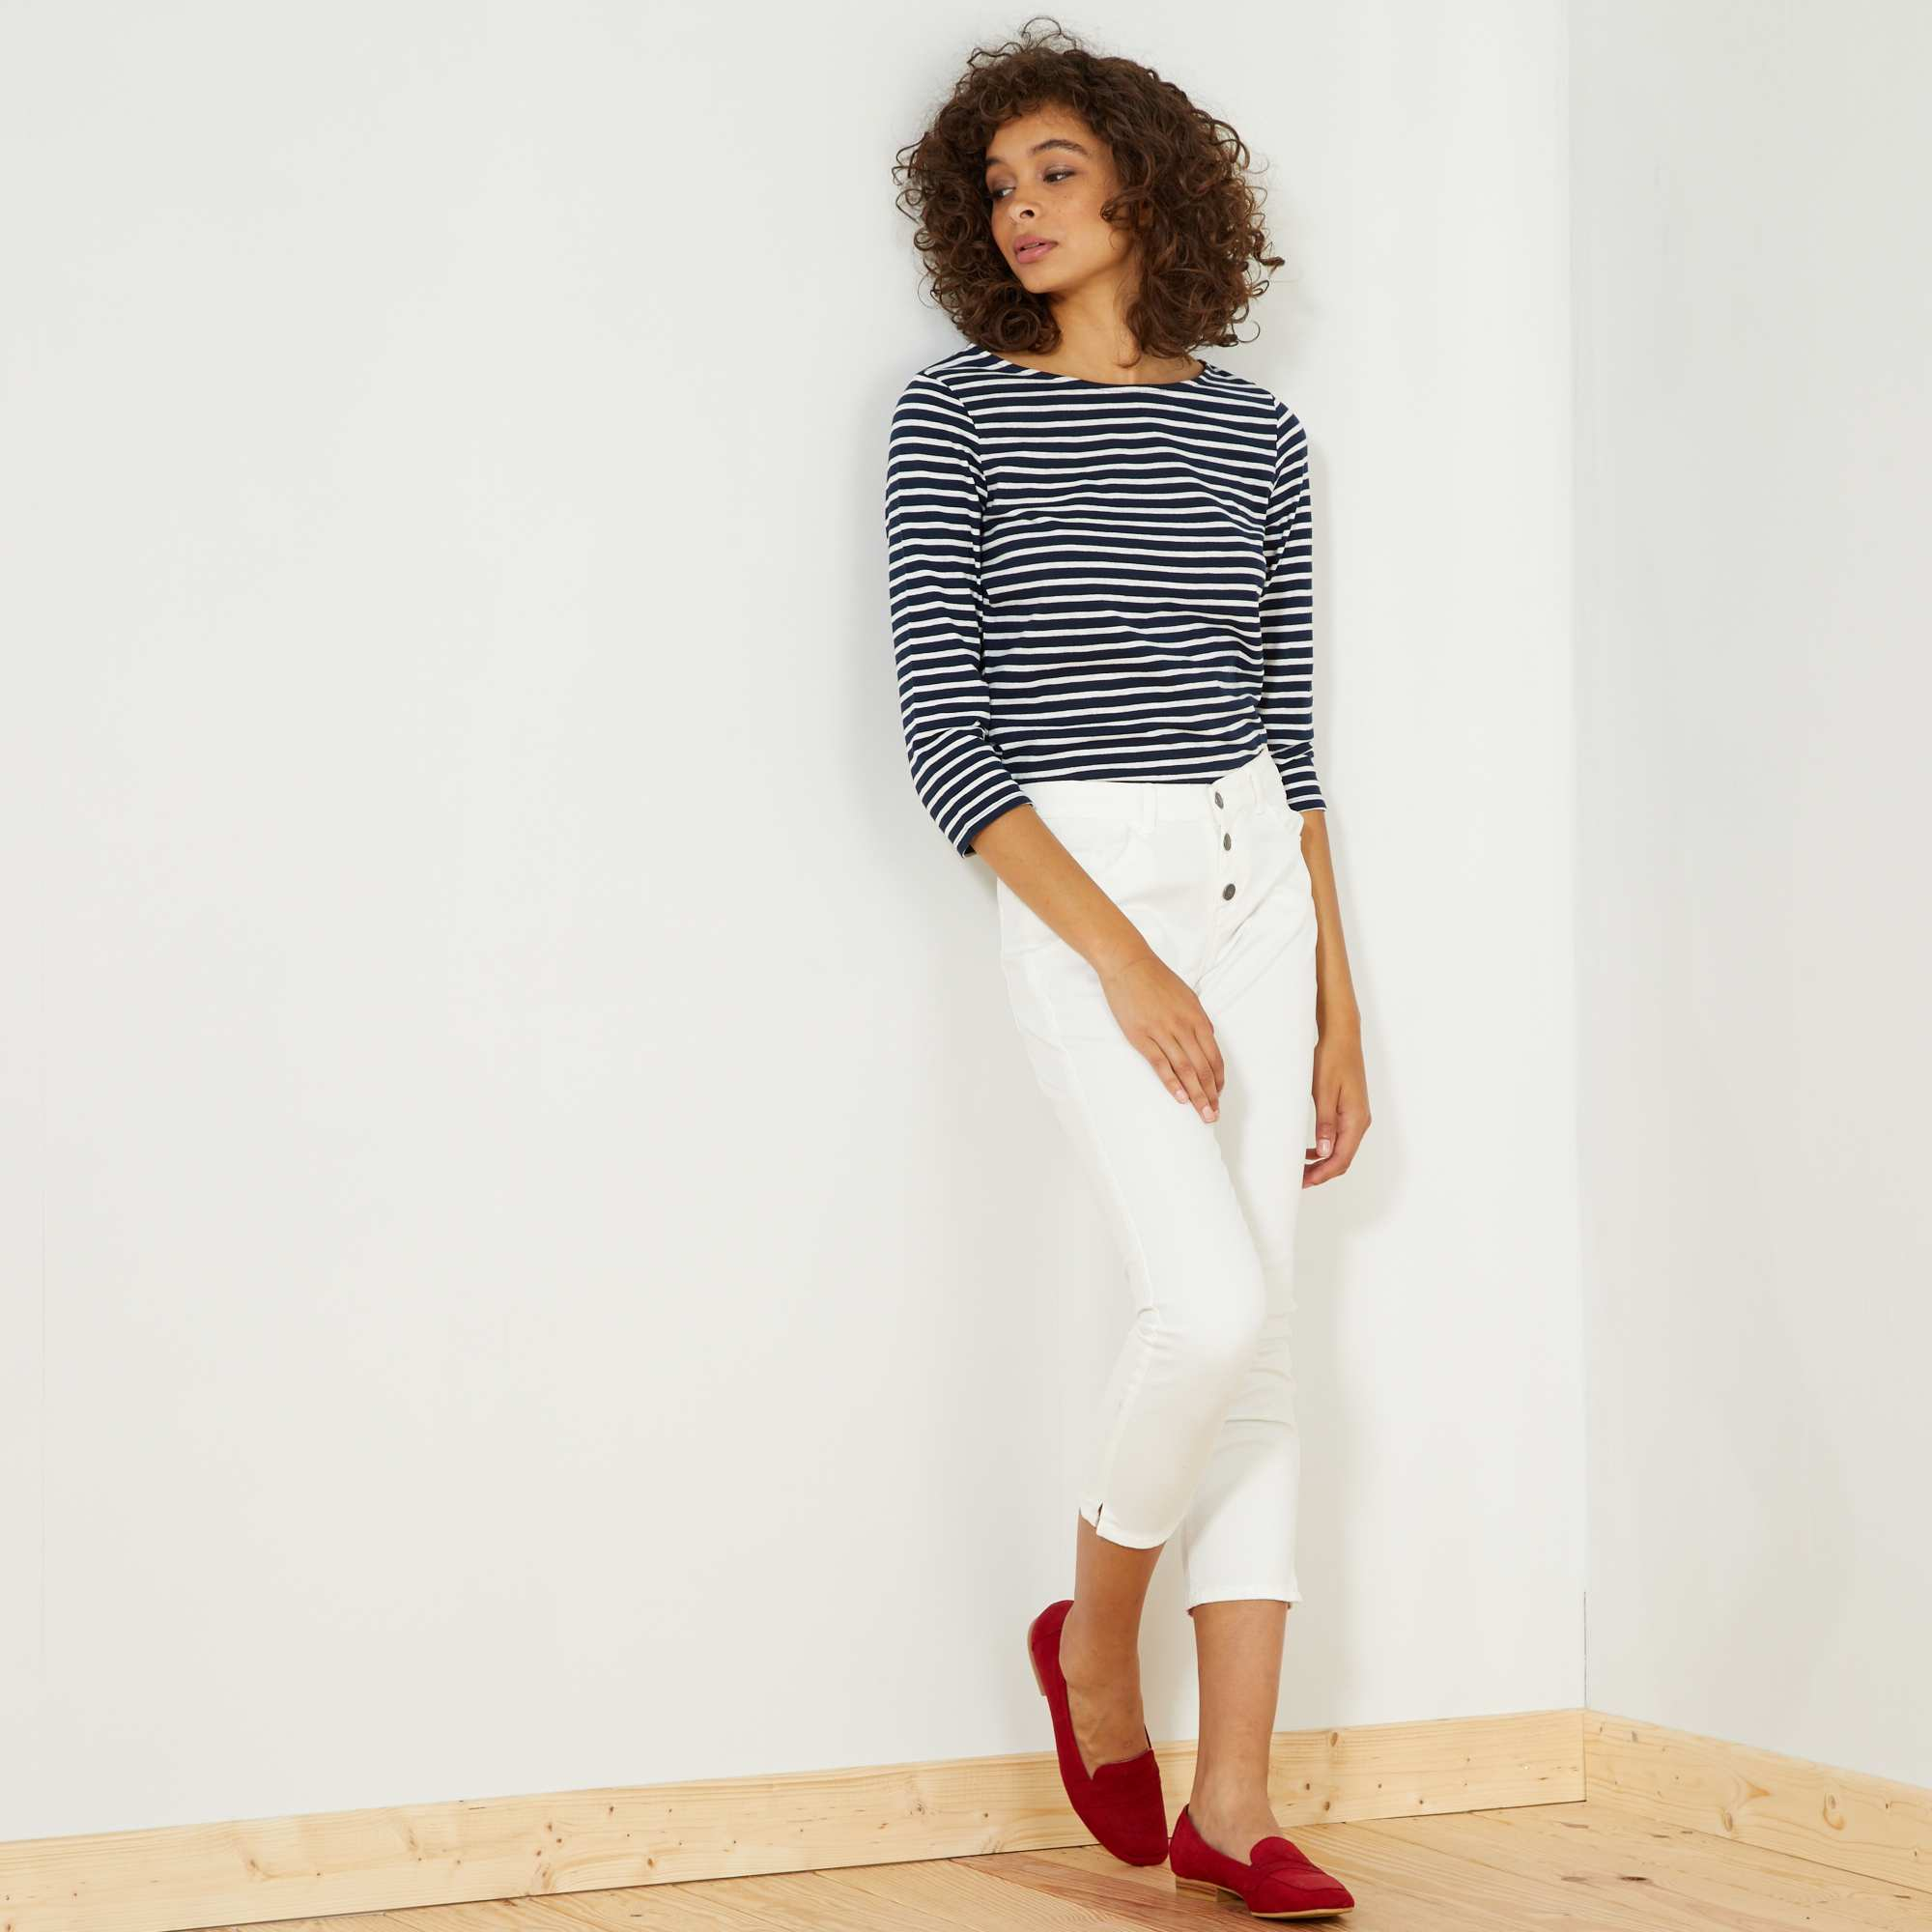 pantalon slim 7 8e taille haute femme kiabi 7 20. Black Bedroom Furniture Sets. Home Design Ideas